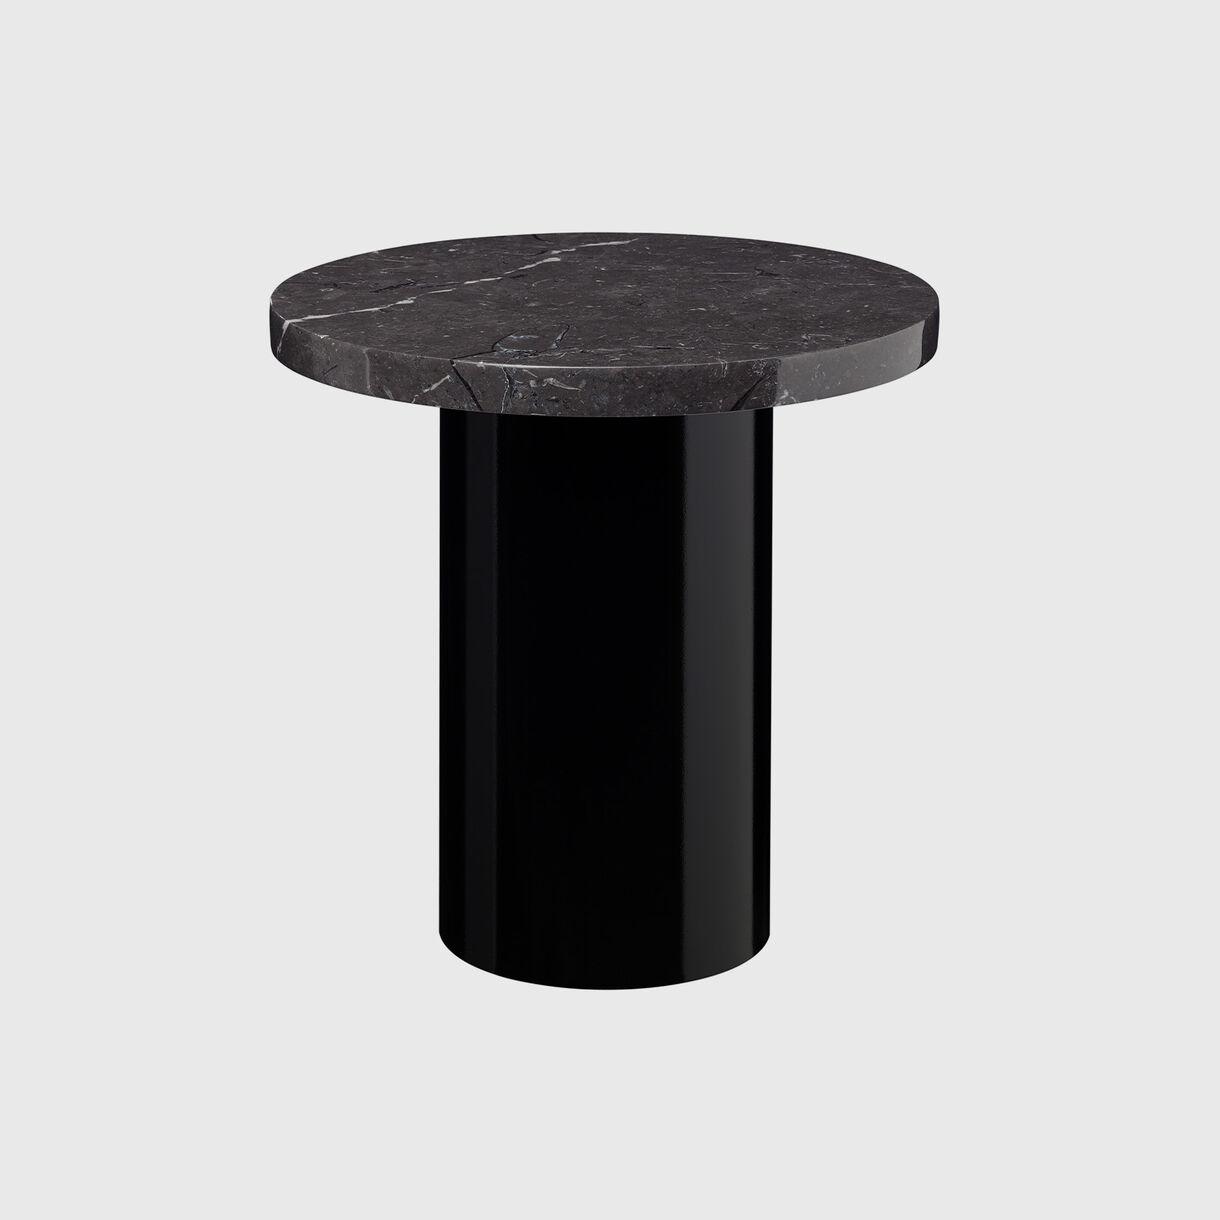 Enoki Side Table, High, Jet Black & Black Marble